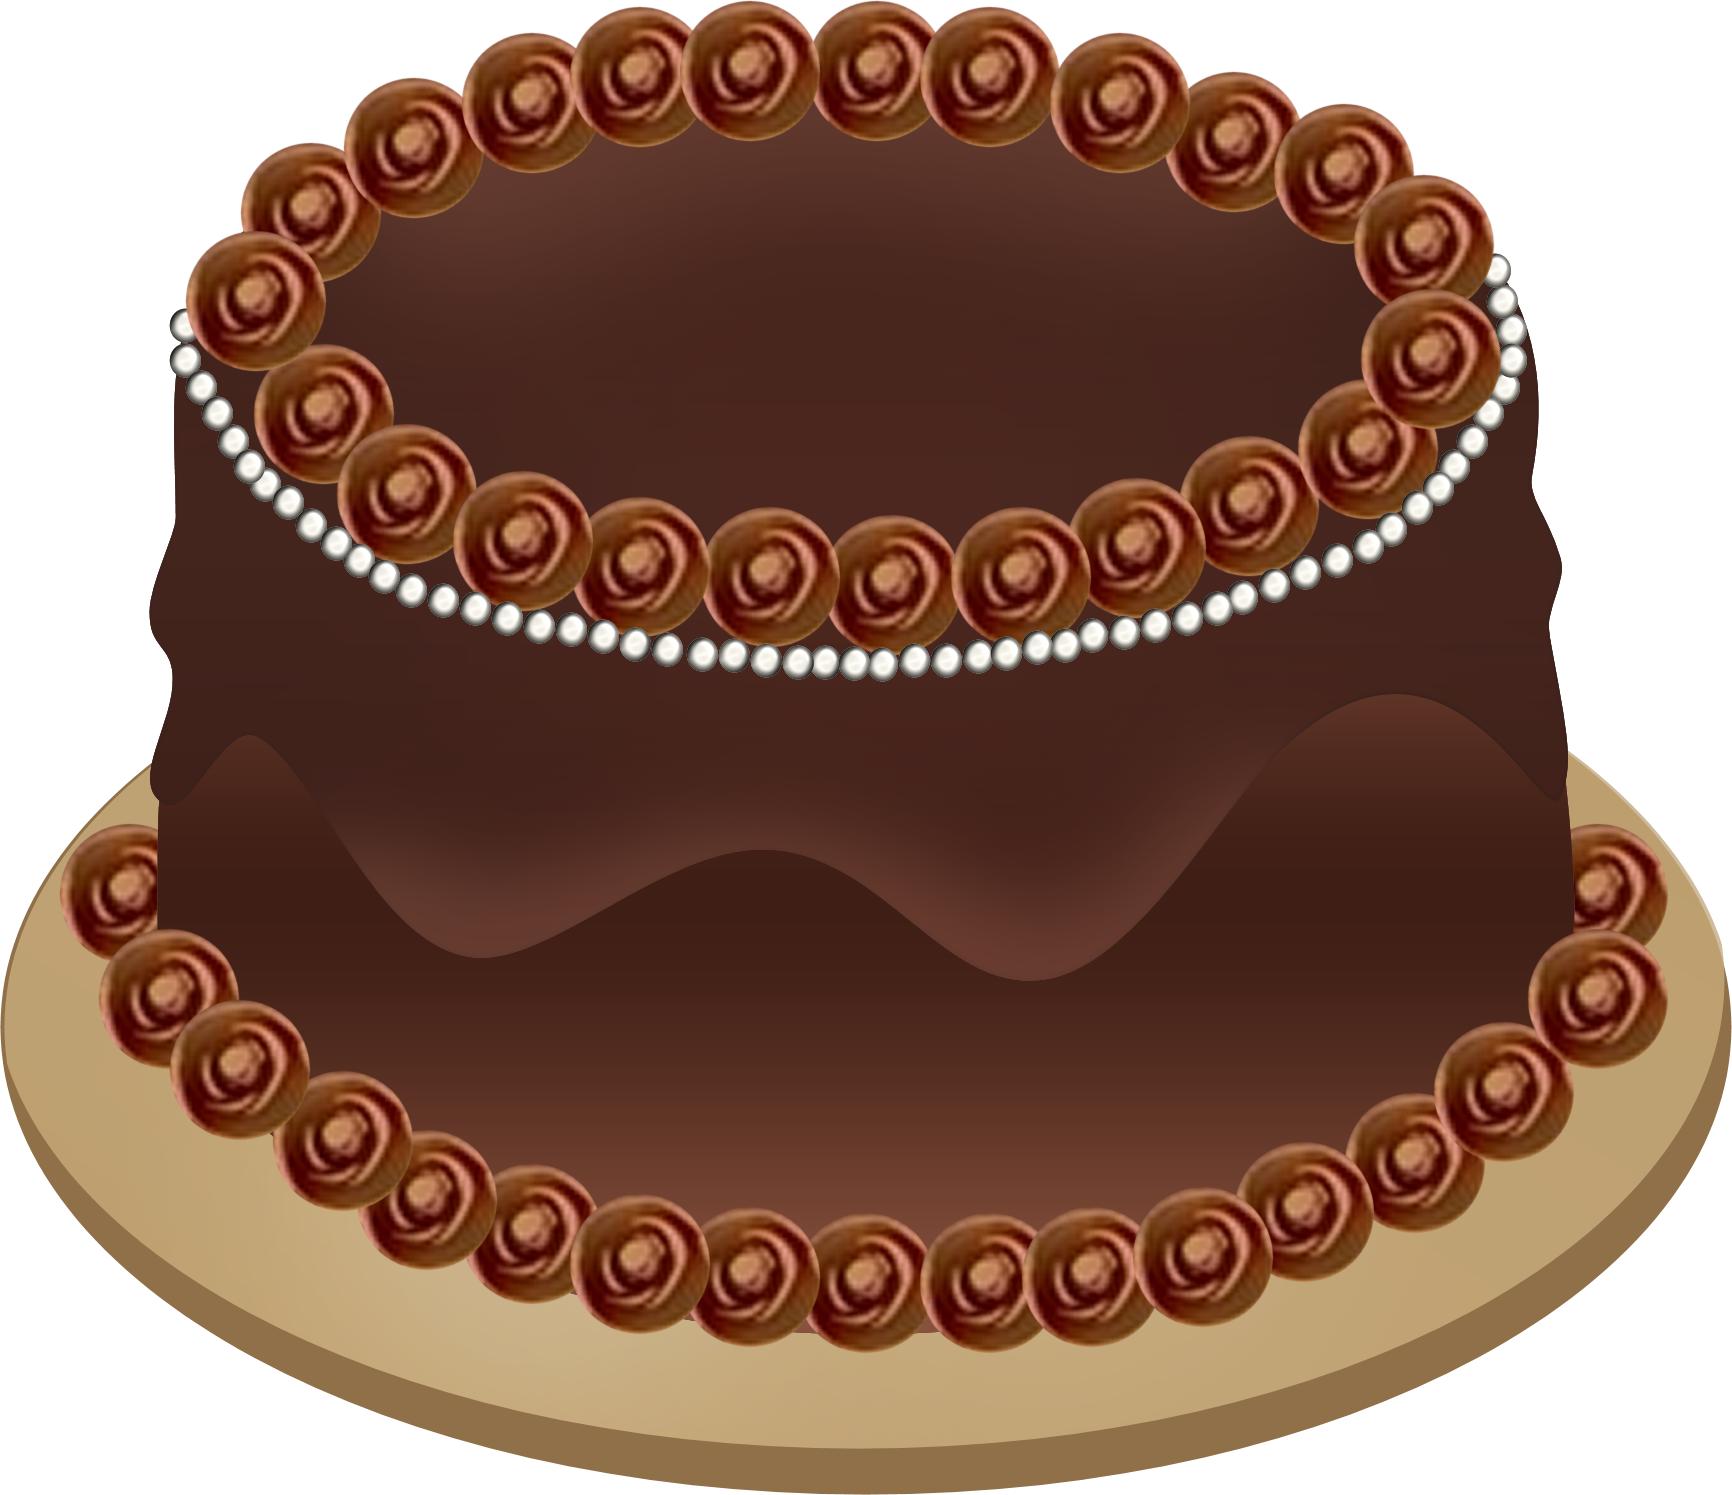 Sponge Cake clipart cartoon Black Chocolate cake cake clipart